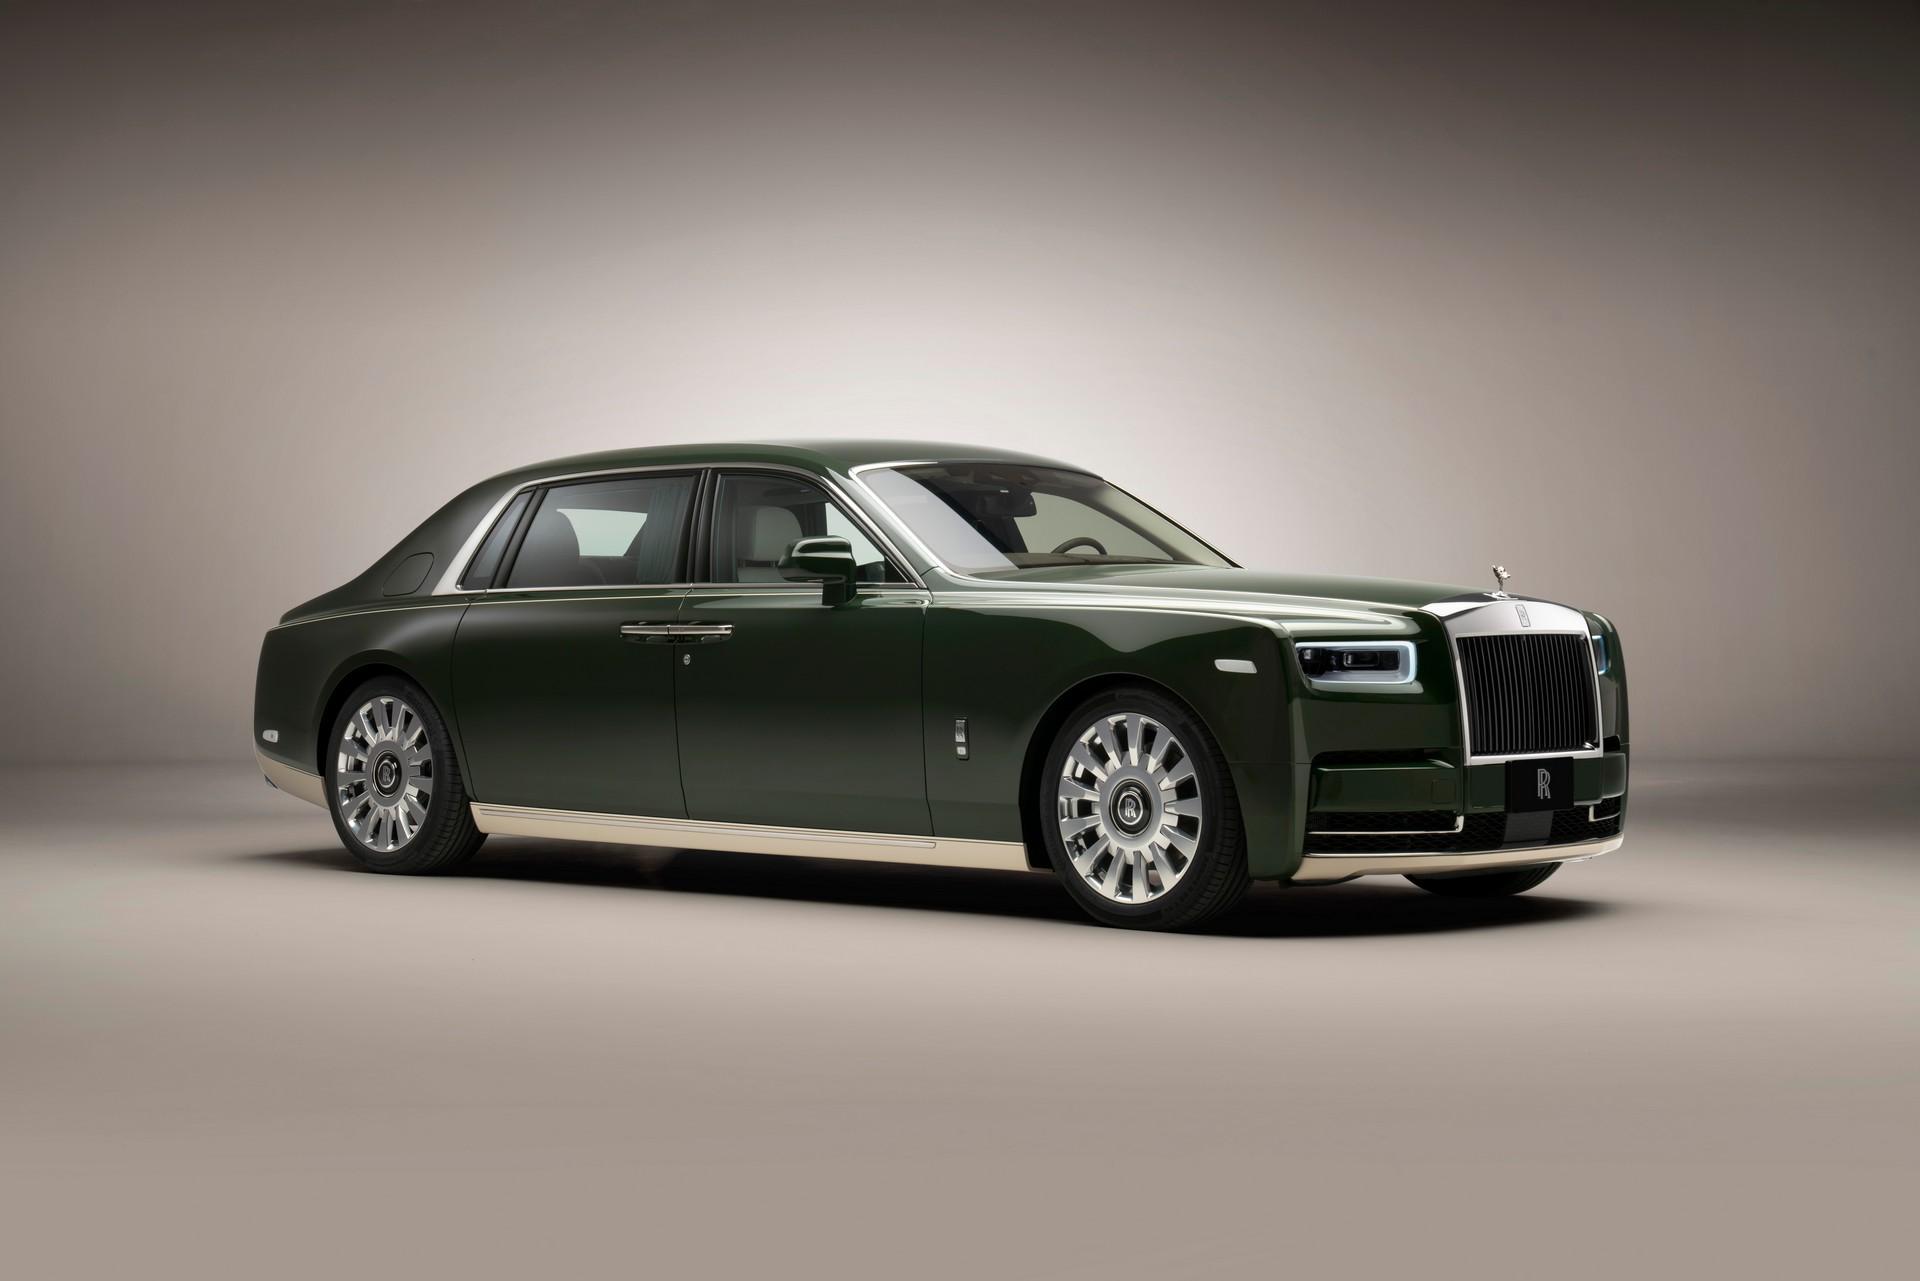 Rolls-Royce-Phantom-Oribe-6.jpg